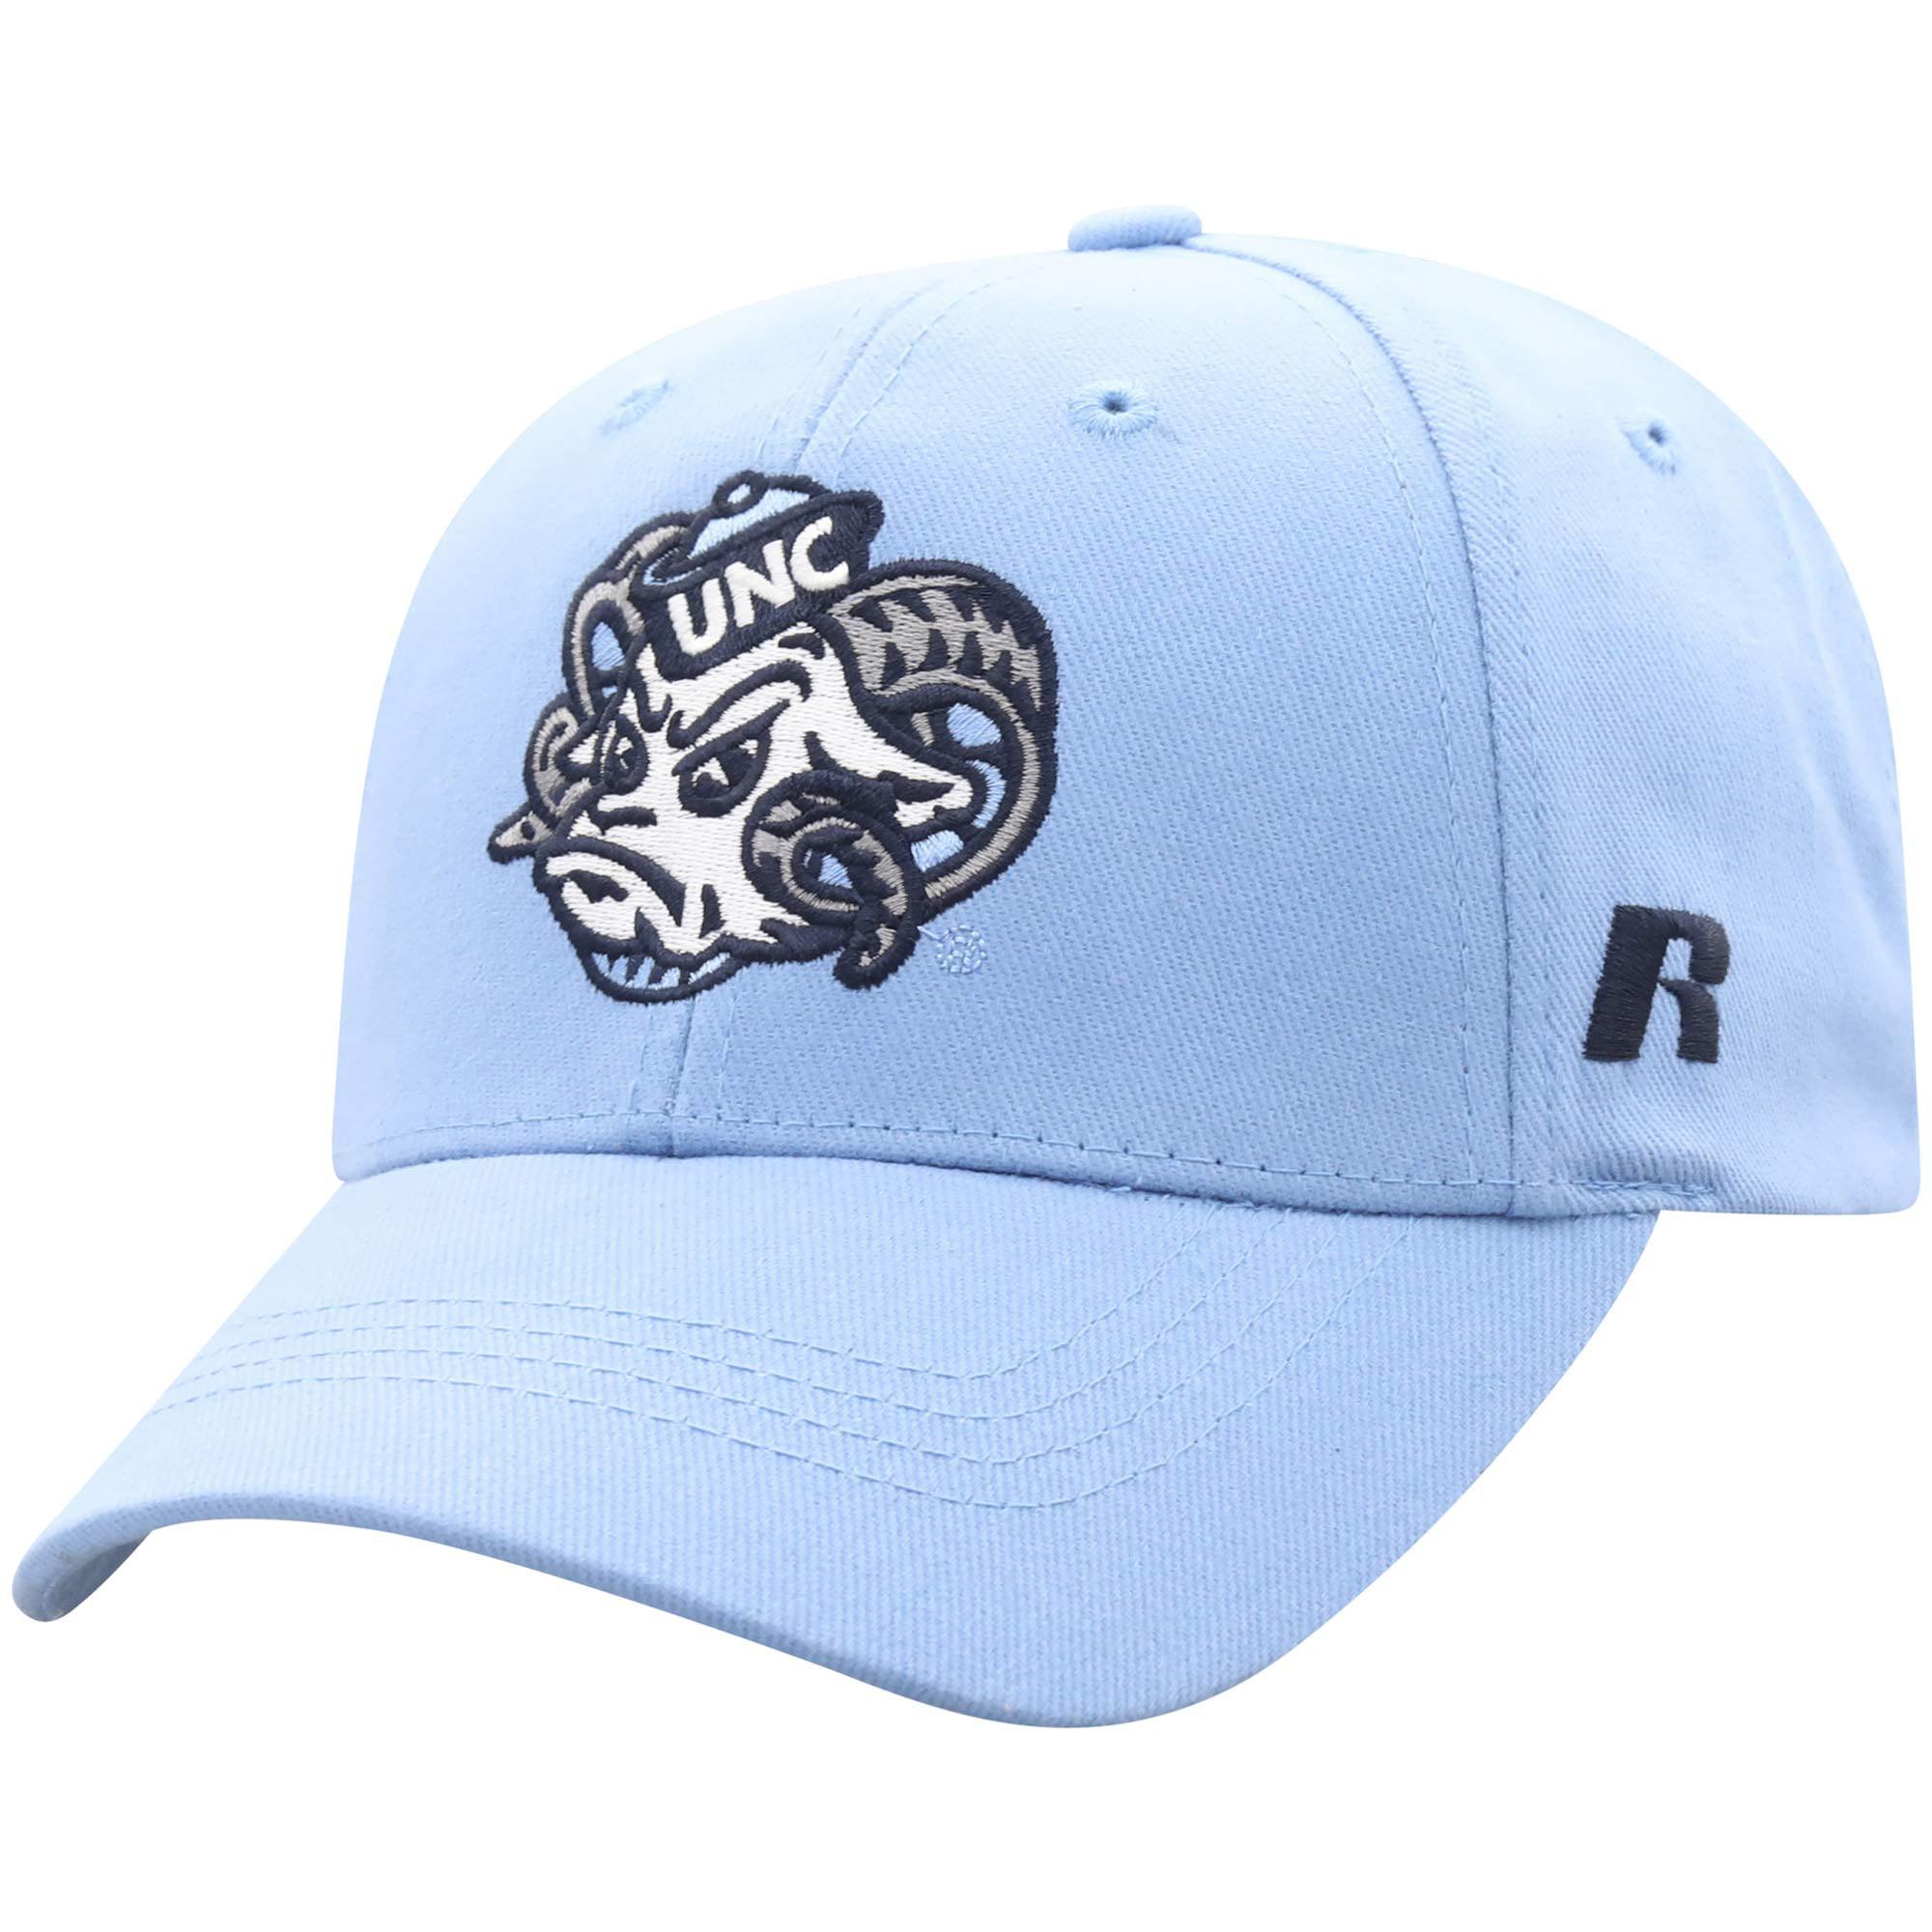 Men's Russell Carolina Blue North Carolina Tar Heels Endless Adjustable Hat - OSFA